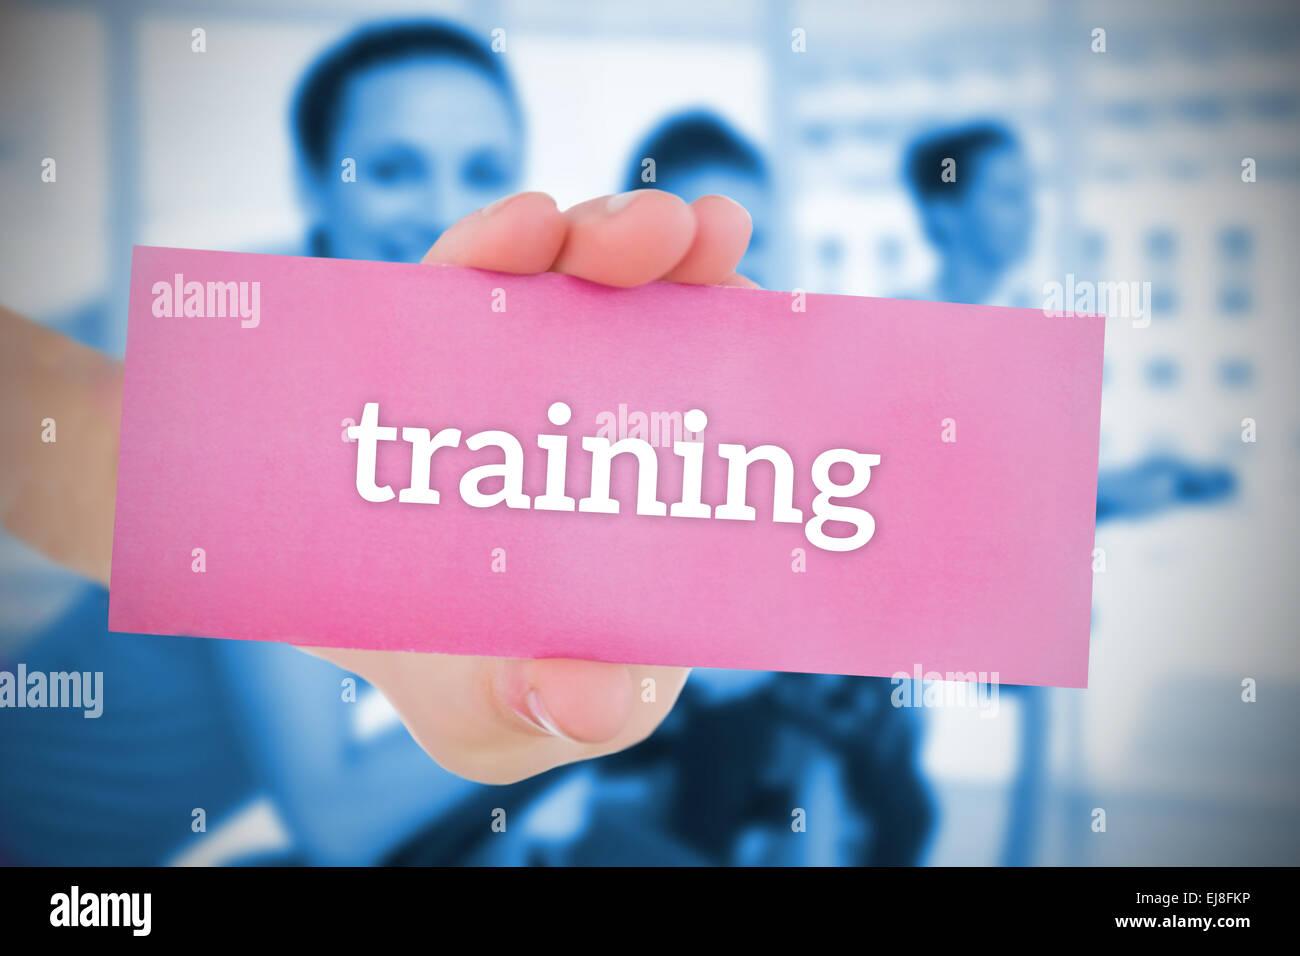 Woman holding pink card saying training - Stock Image